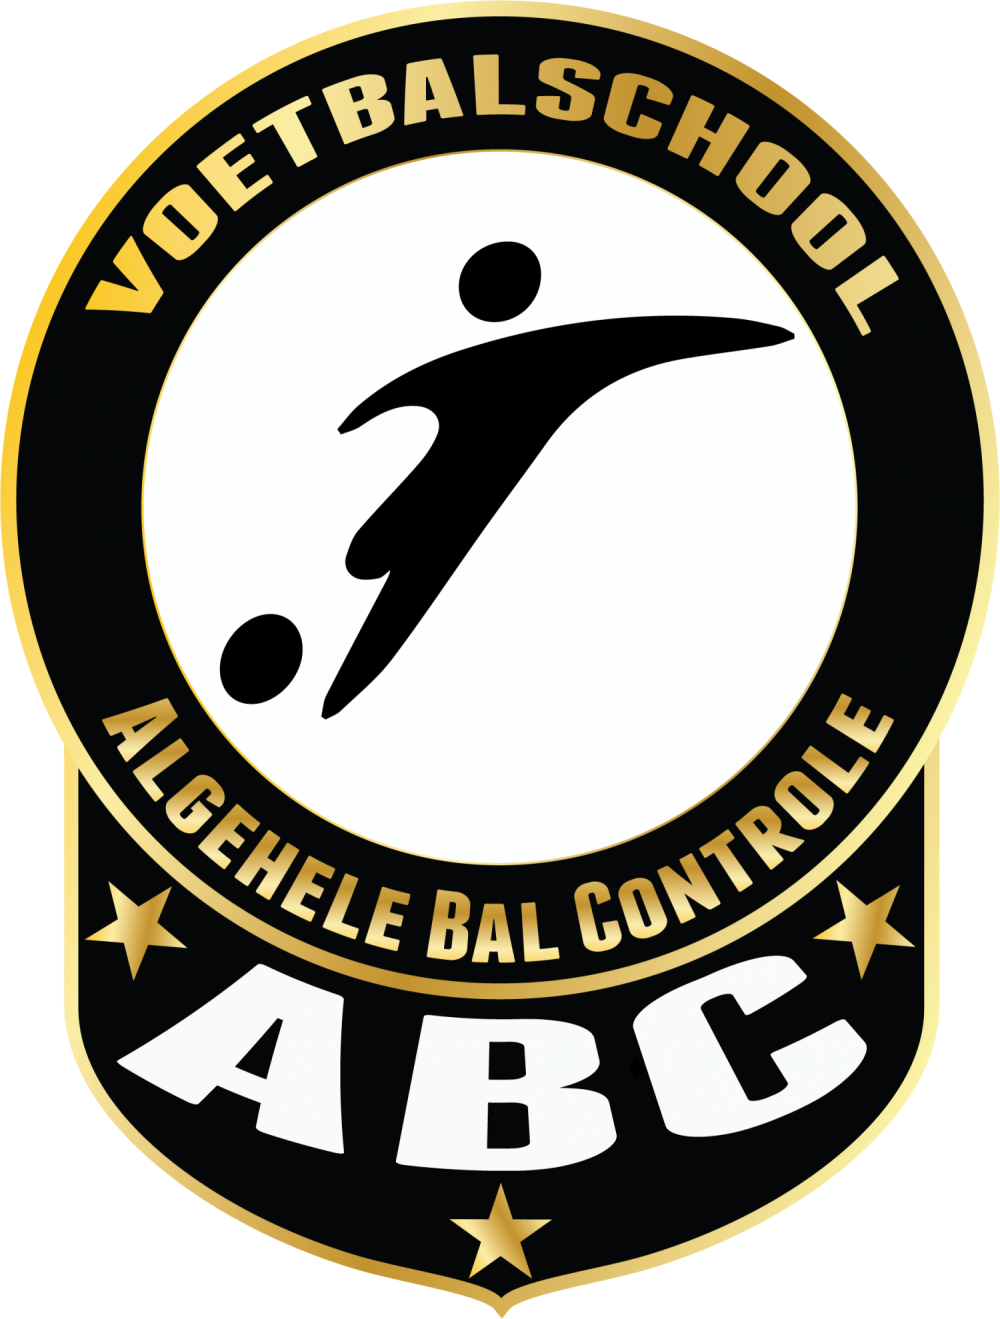 Voetbalschool ABC